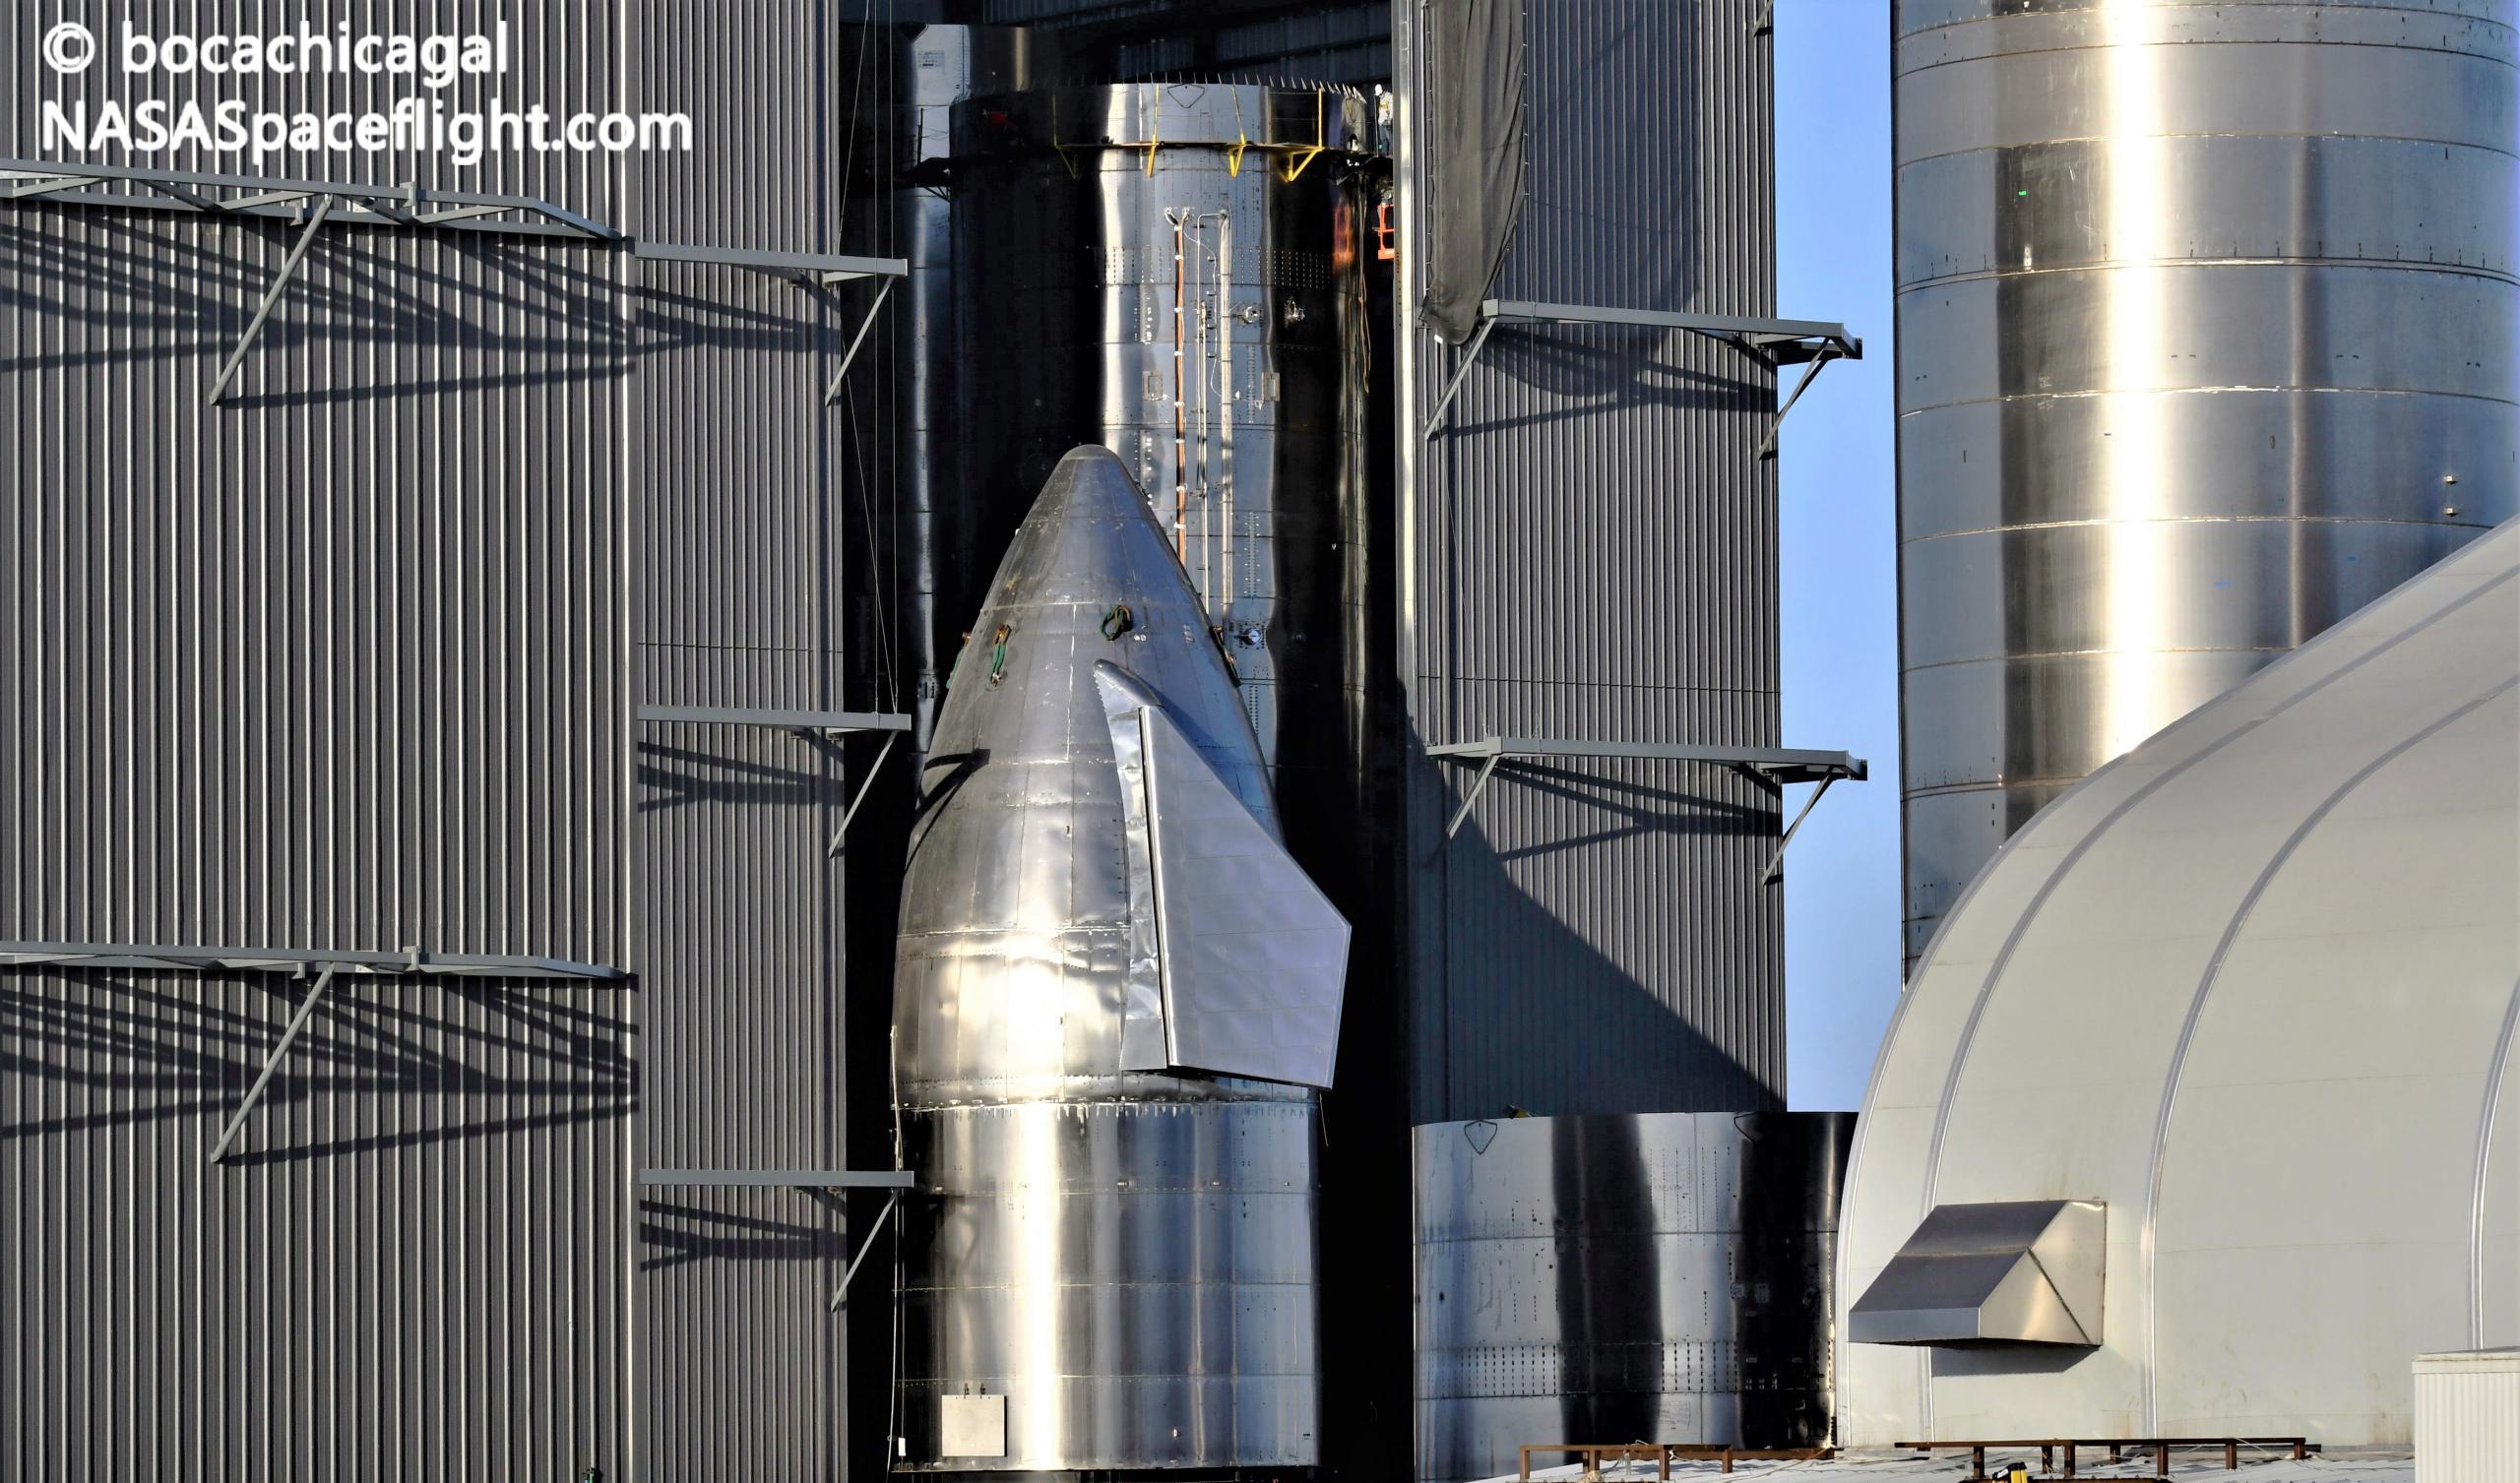 Starship Boca Chica 020721 (NASASpaceflight – bocachicagal) SN11 nose install + BN1 1 crop (c)